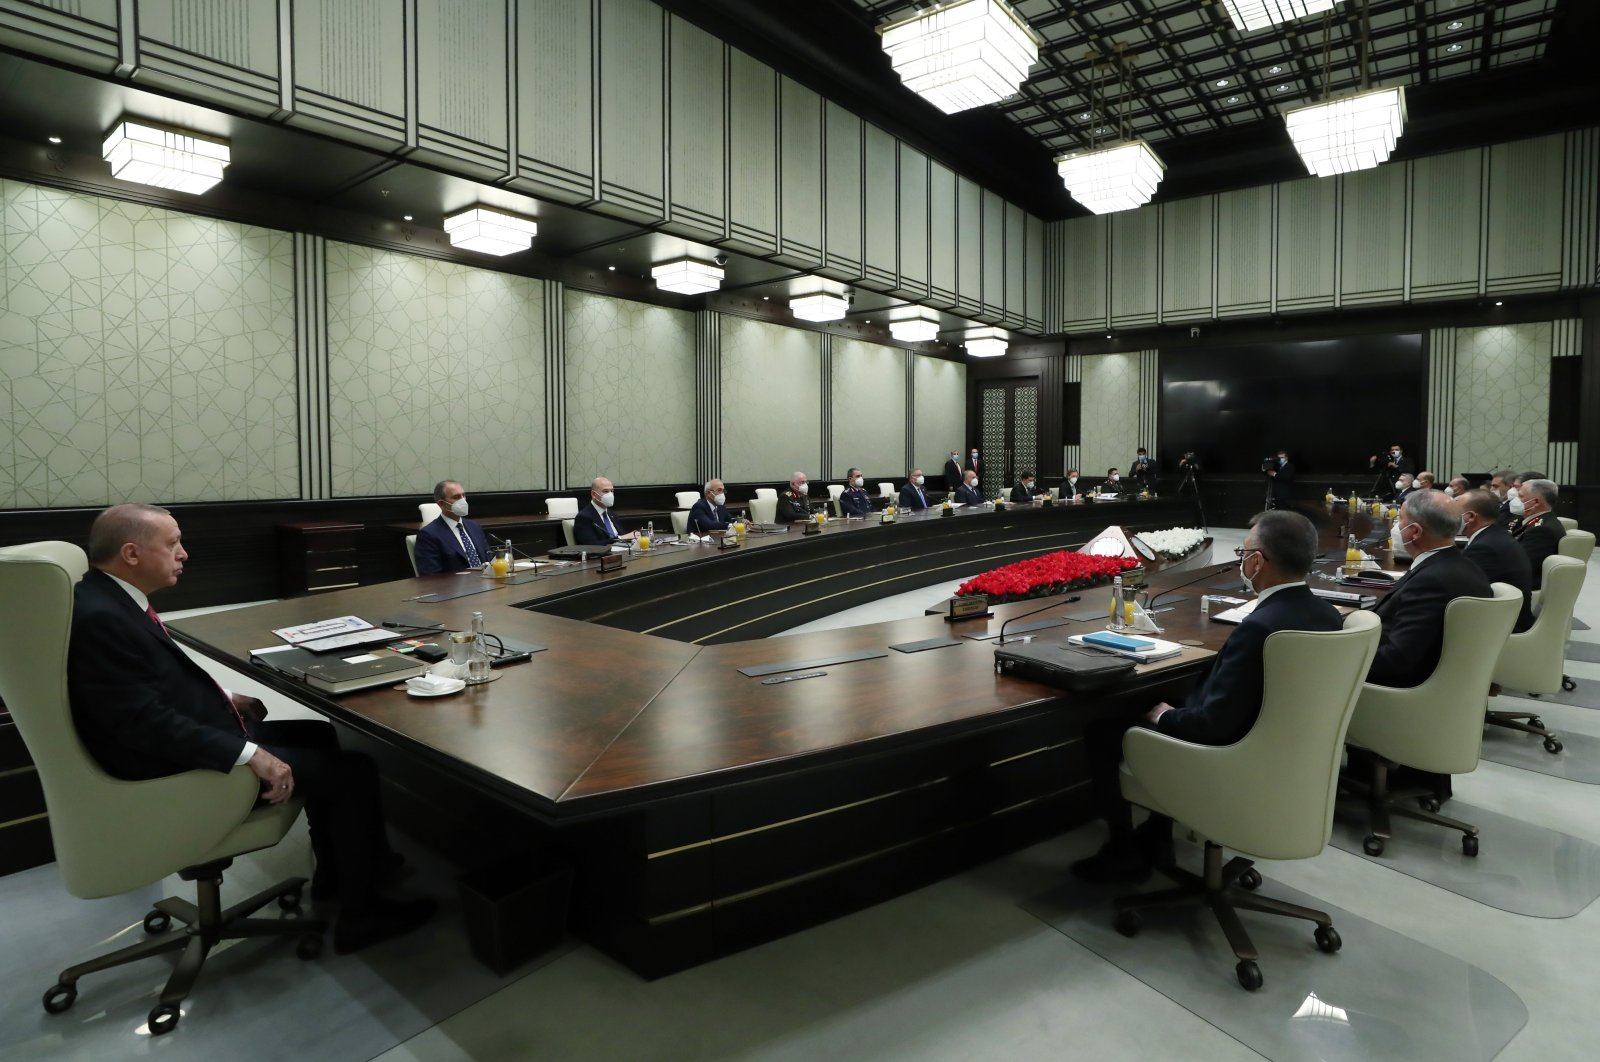 Turkey's National Security Council meets under the chair of President Recep Tayyip Erdoğan in the capital Ankara, Nov. 25, 2020. (AA Photo)